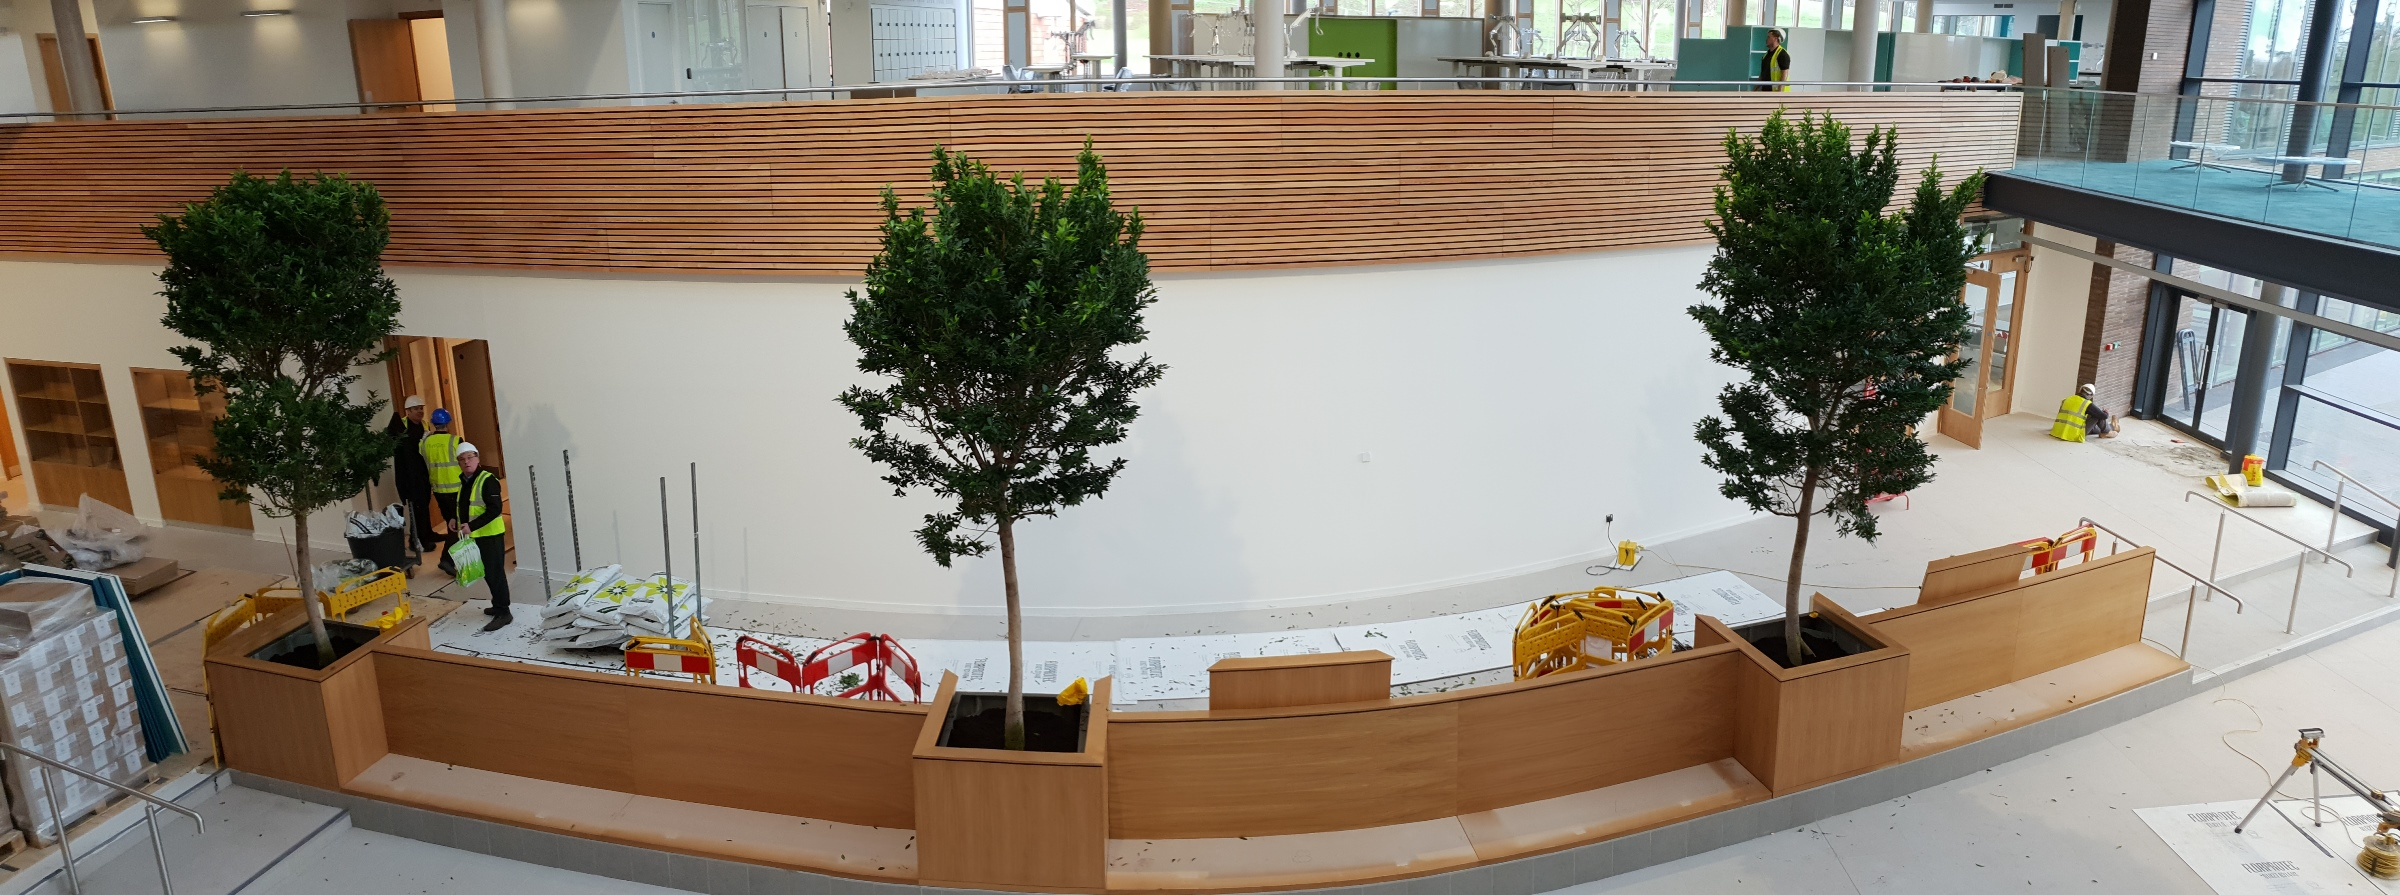 indoor-tree-internal-tree.jpg